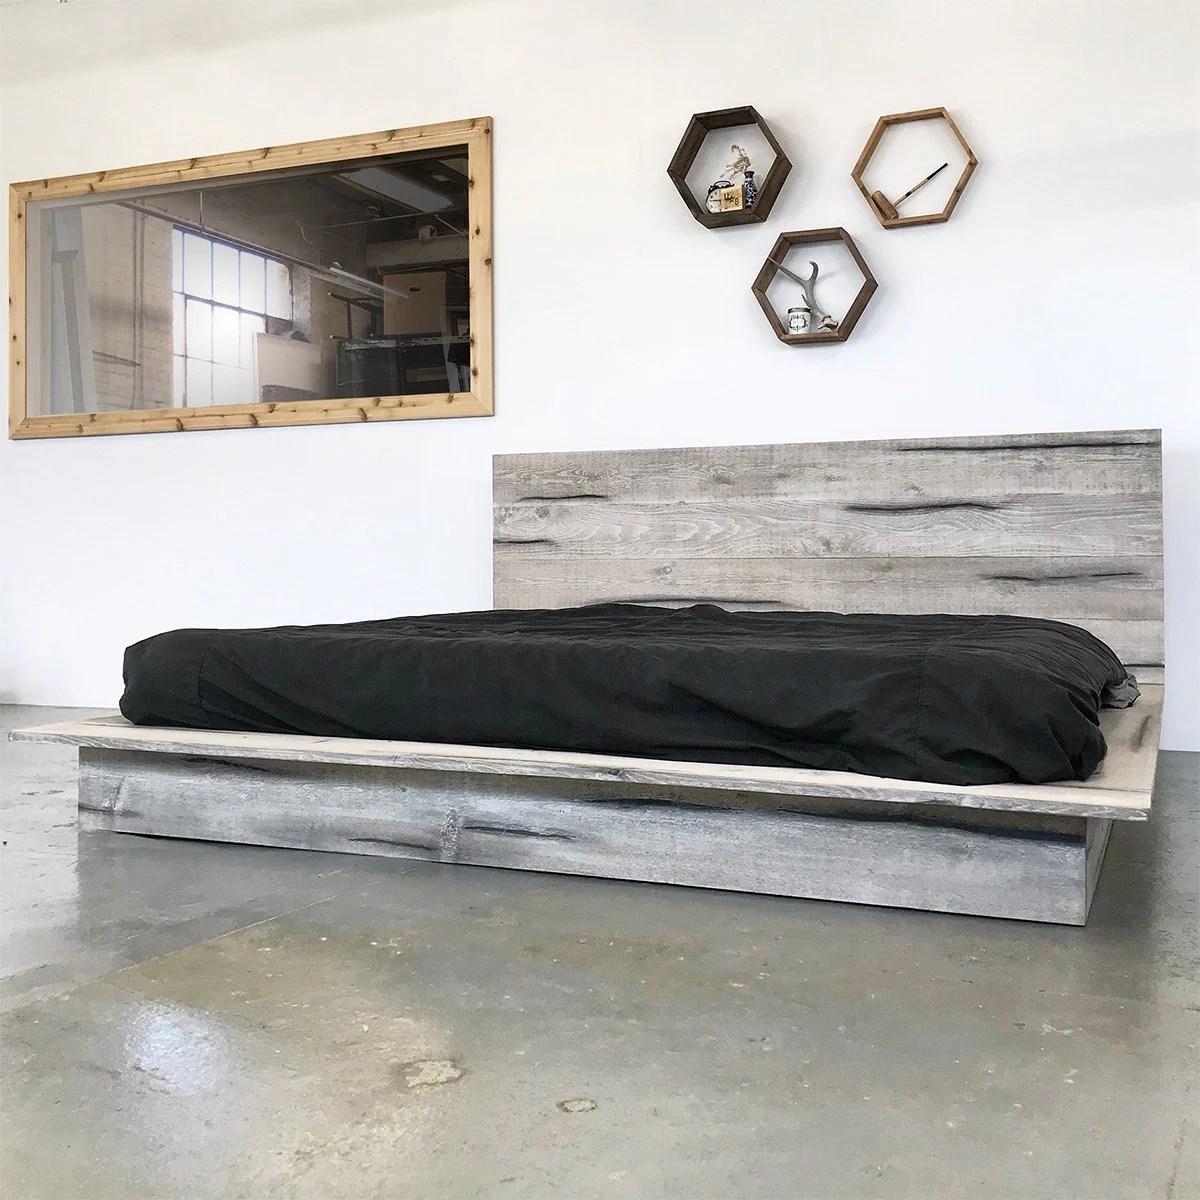 Rustic Modern Platform Bed Frame and Headboard Boho Loft ... on Modern Boho Bed Frame  id=29006